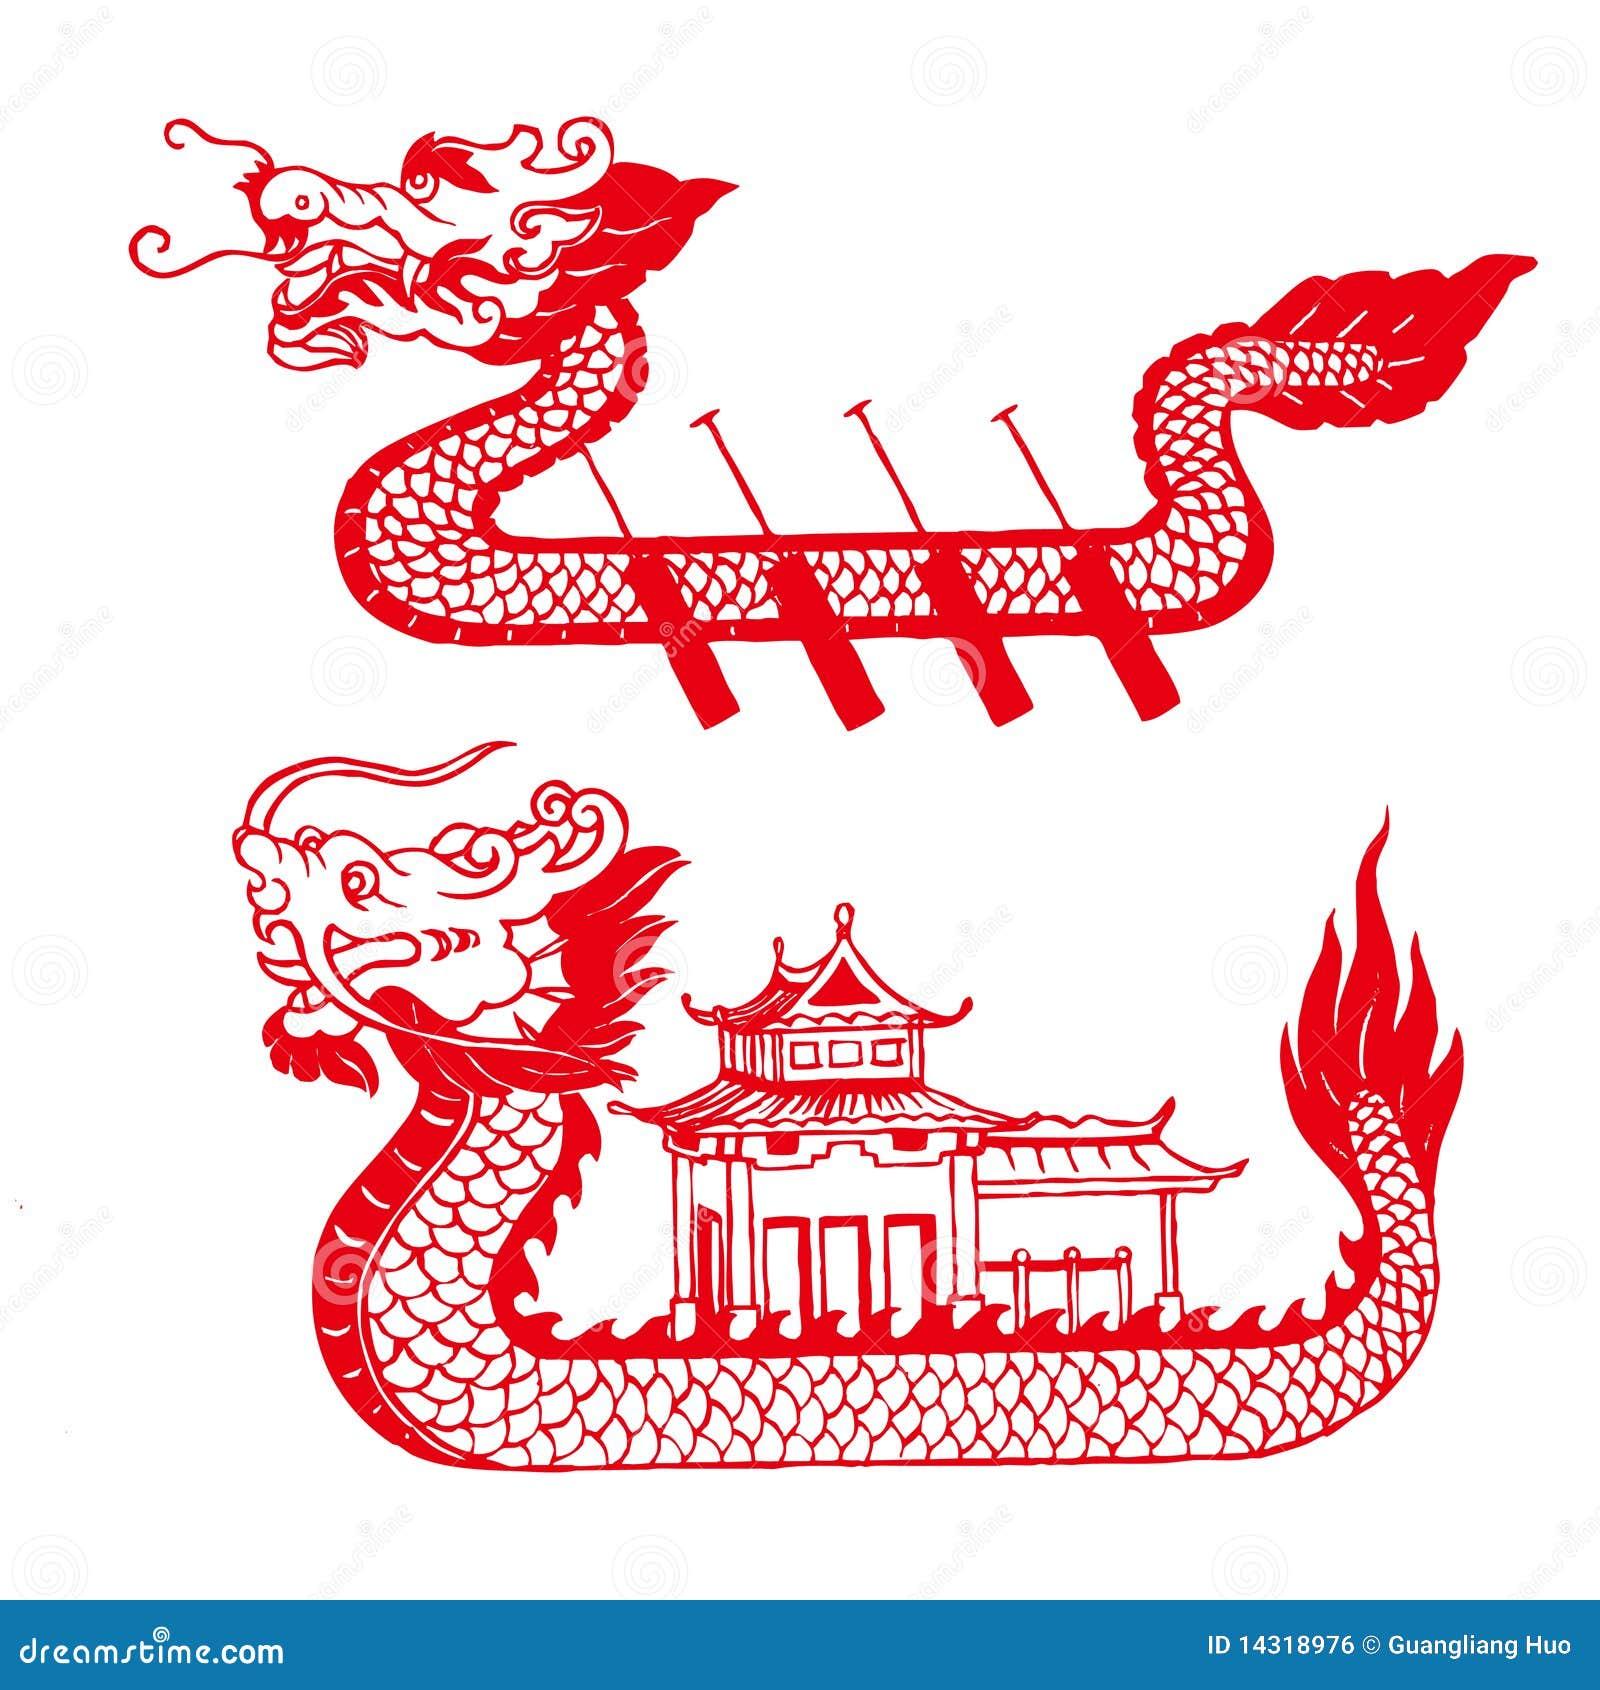 Dragon Boat Royalty Free Stock Image - Image: 14318976